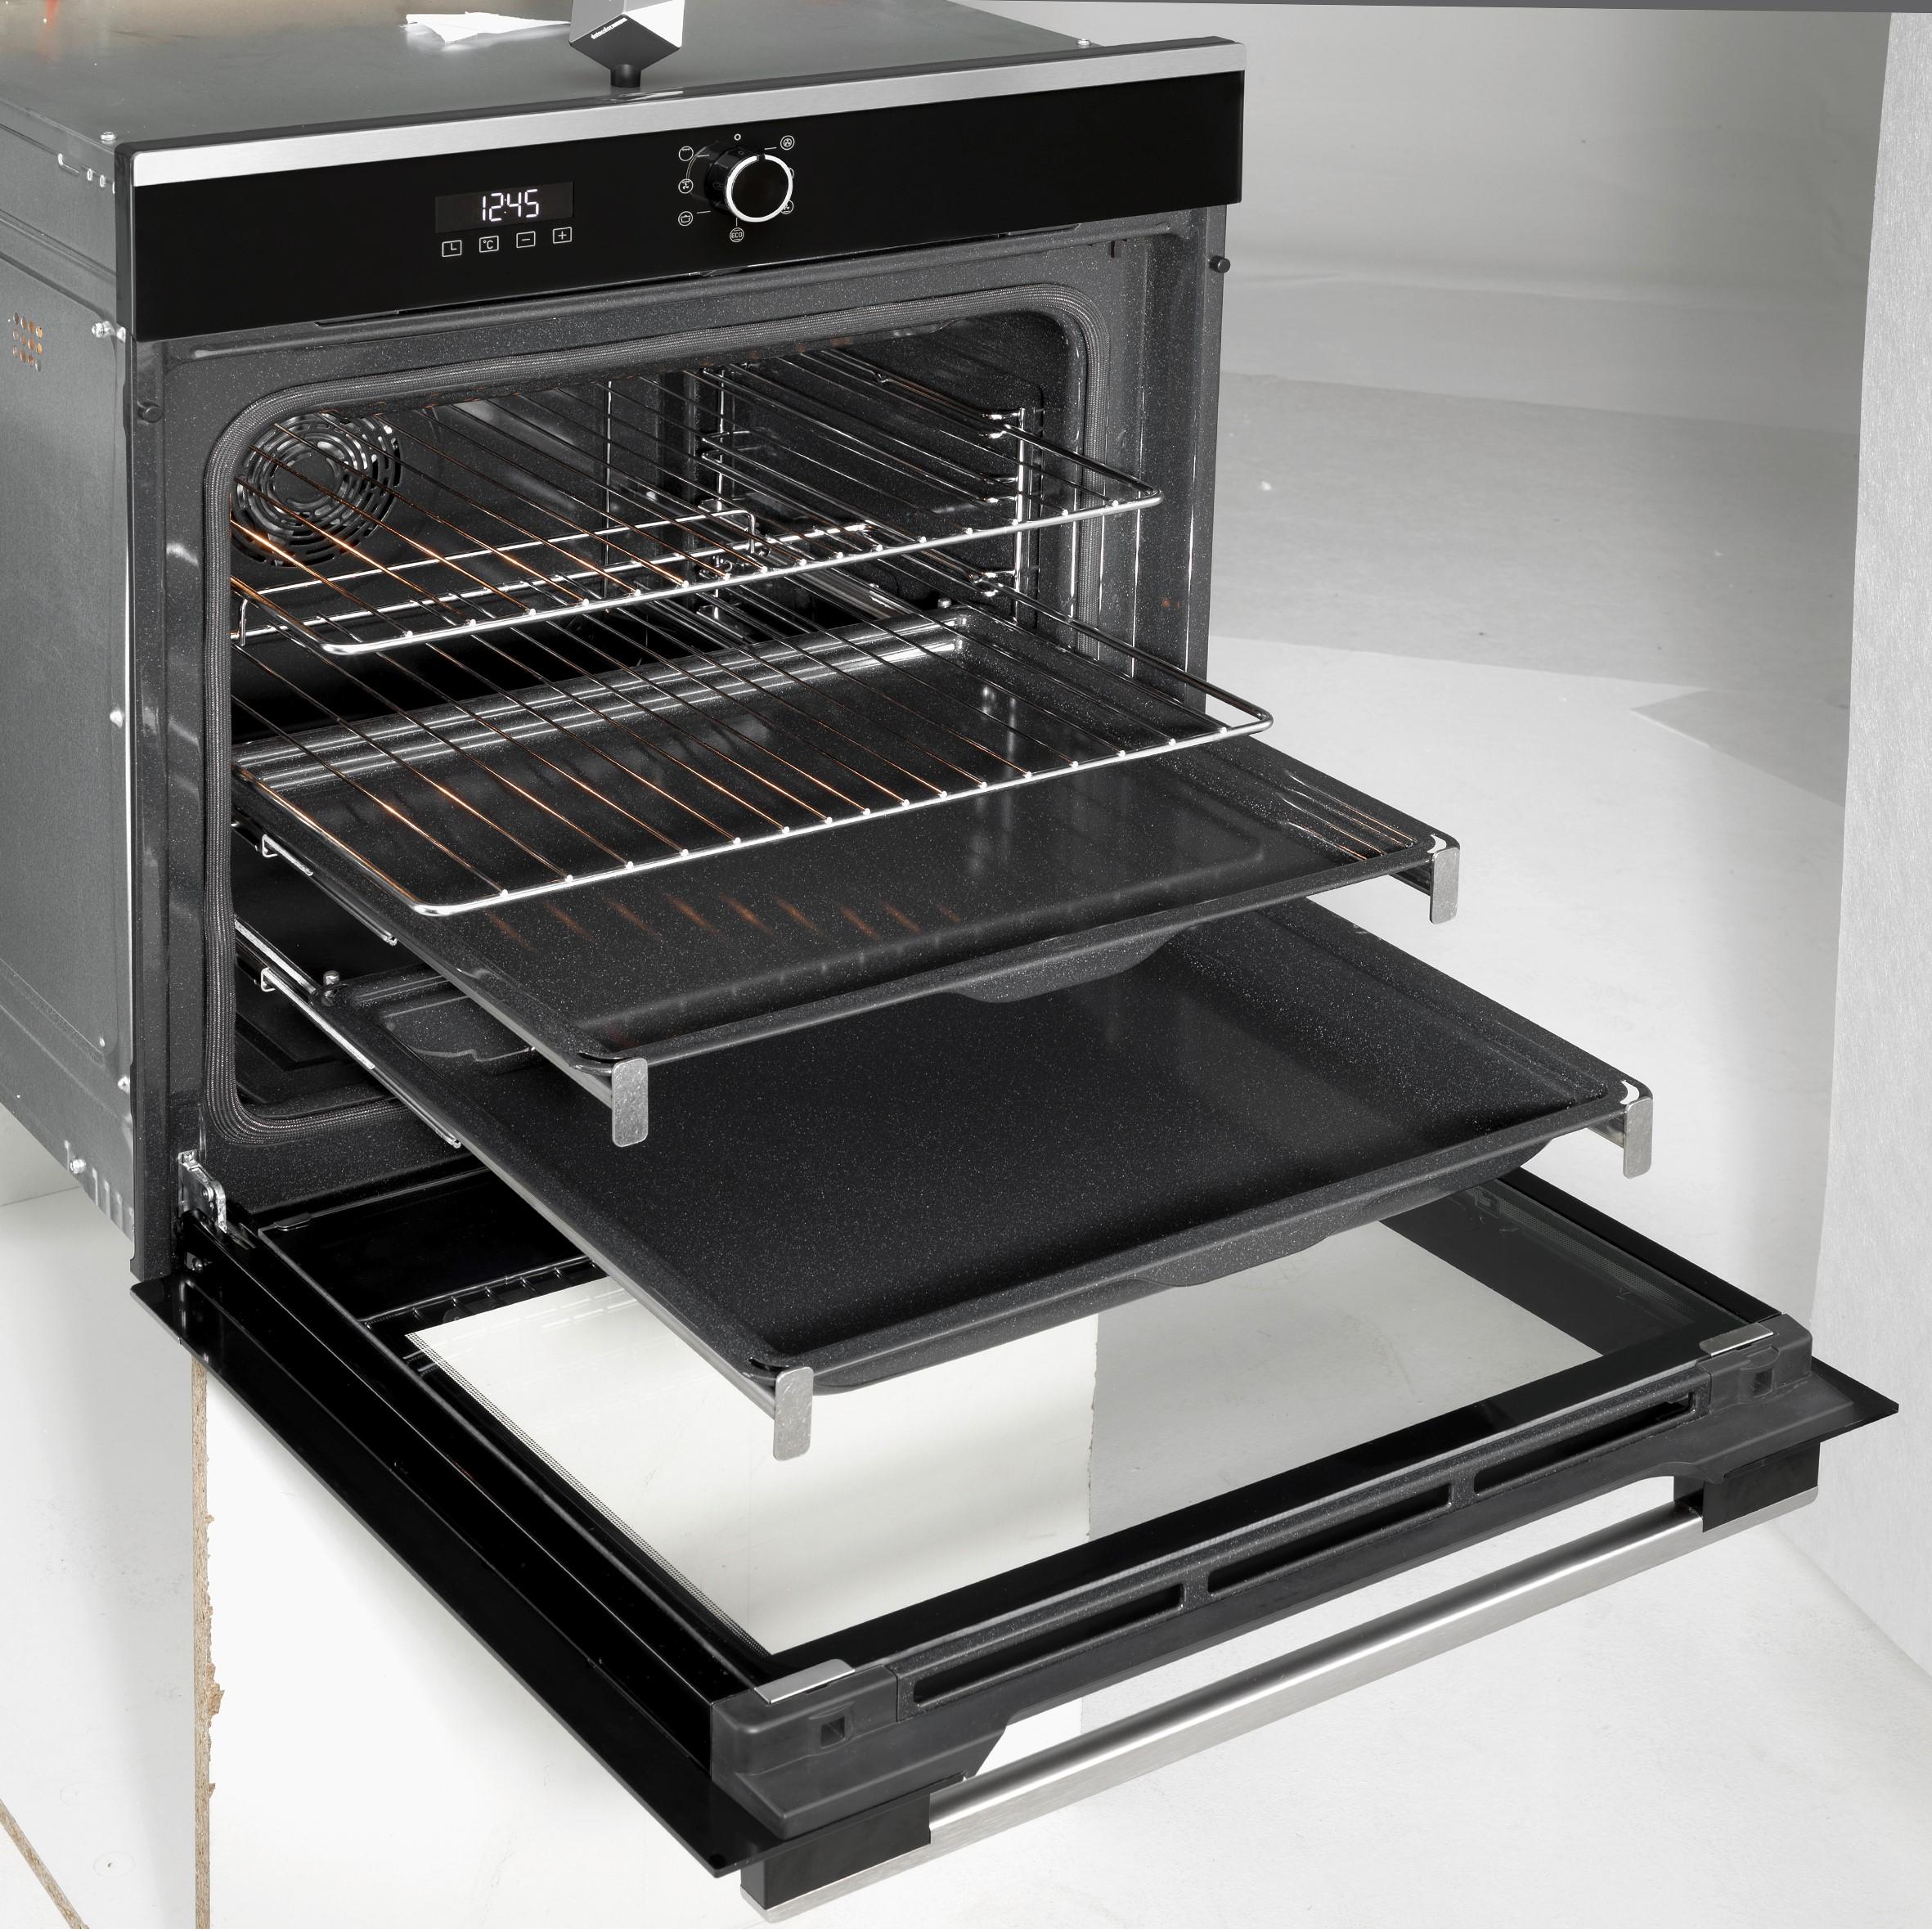 Area 30 Oranier Presents A Full Range For The Kitchen Home